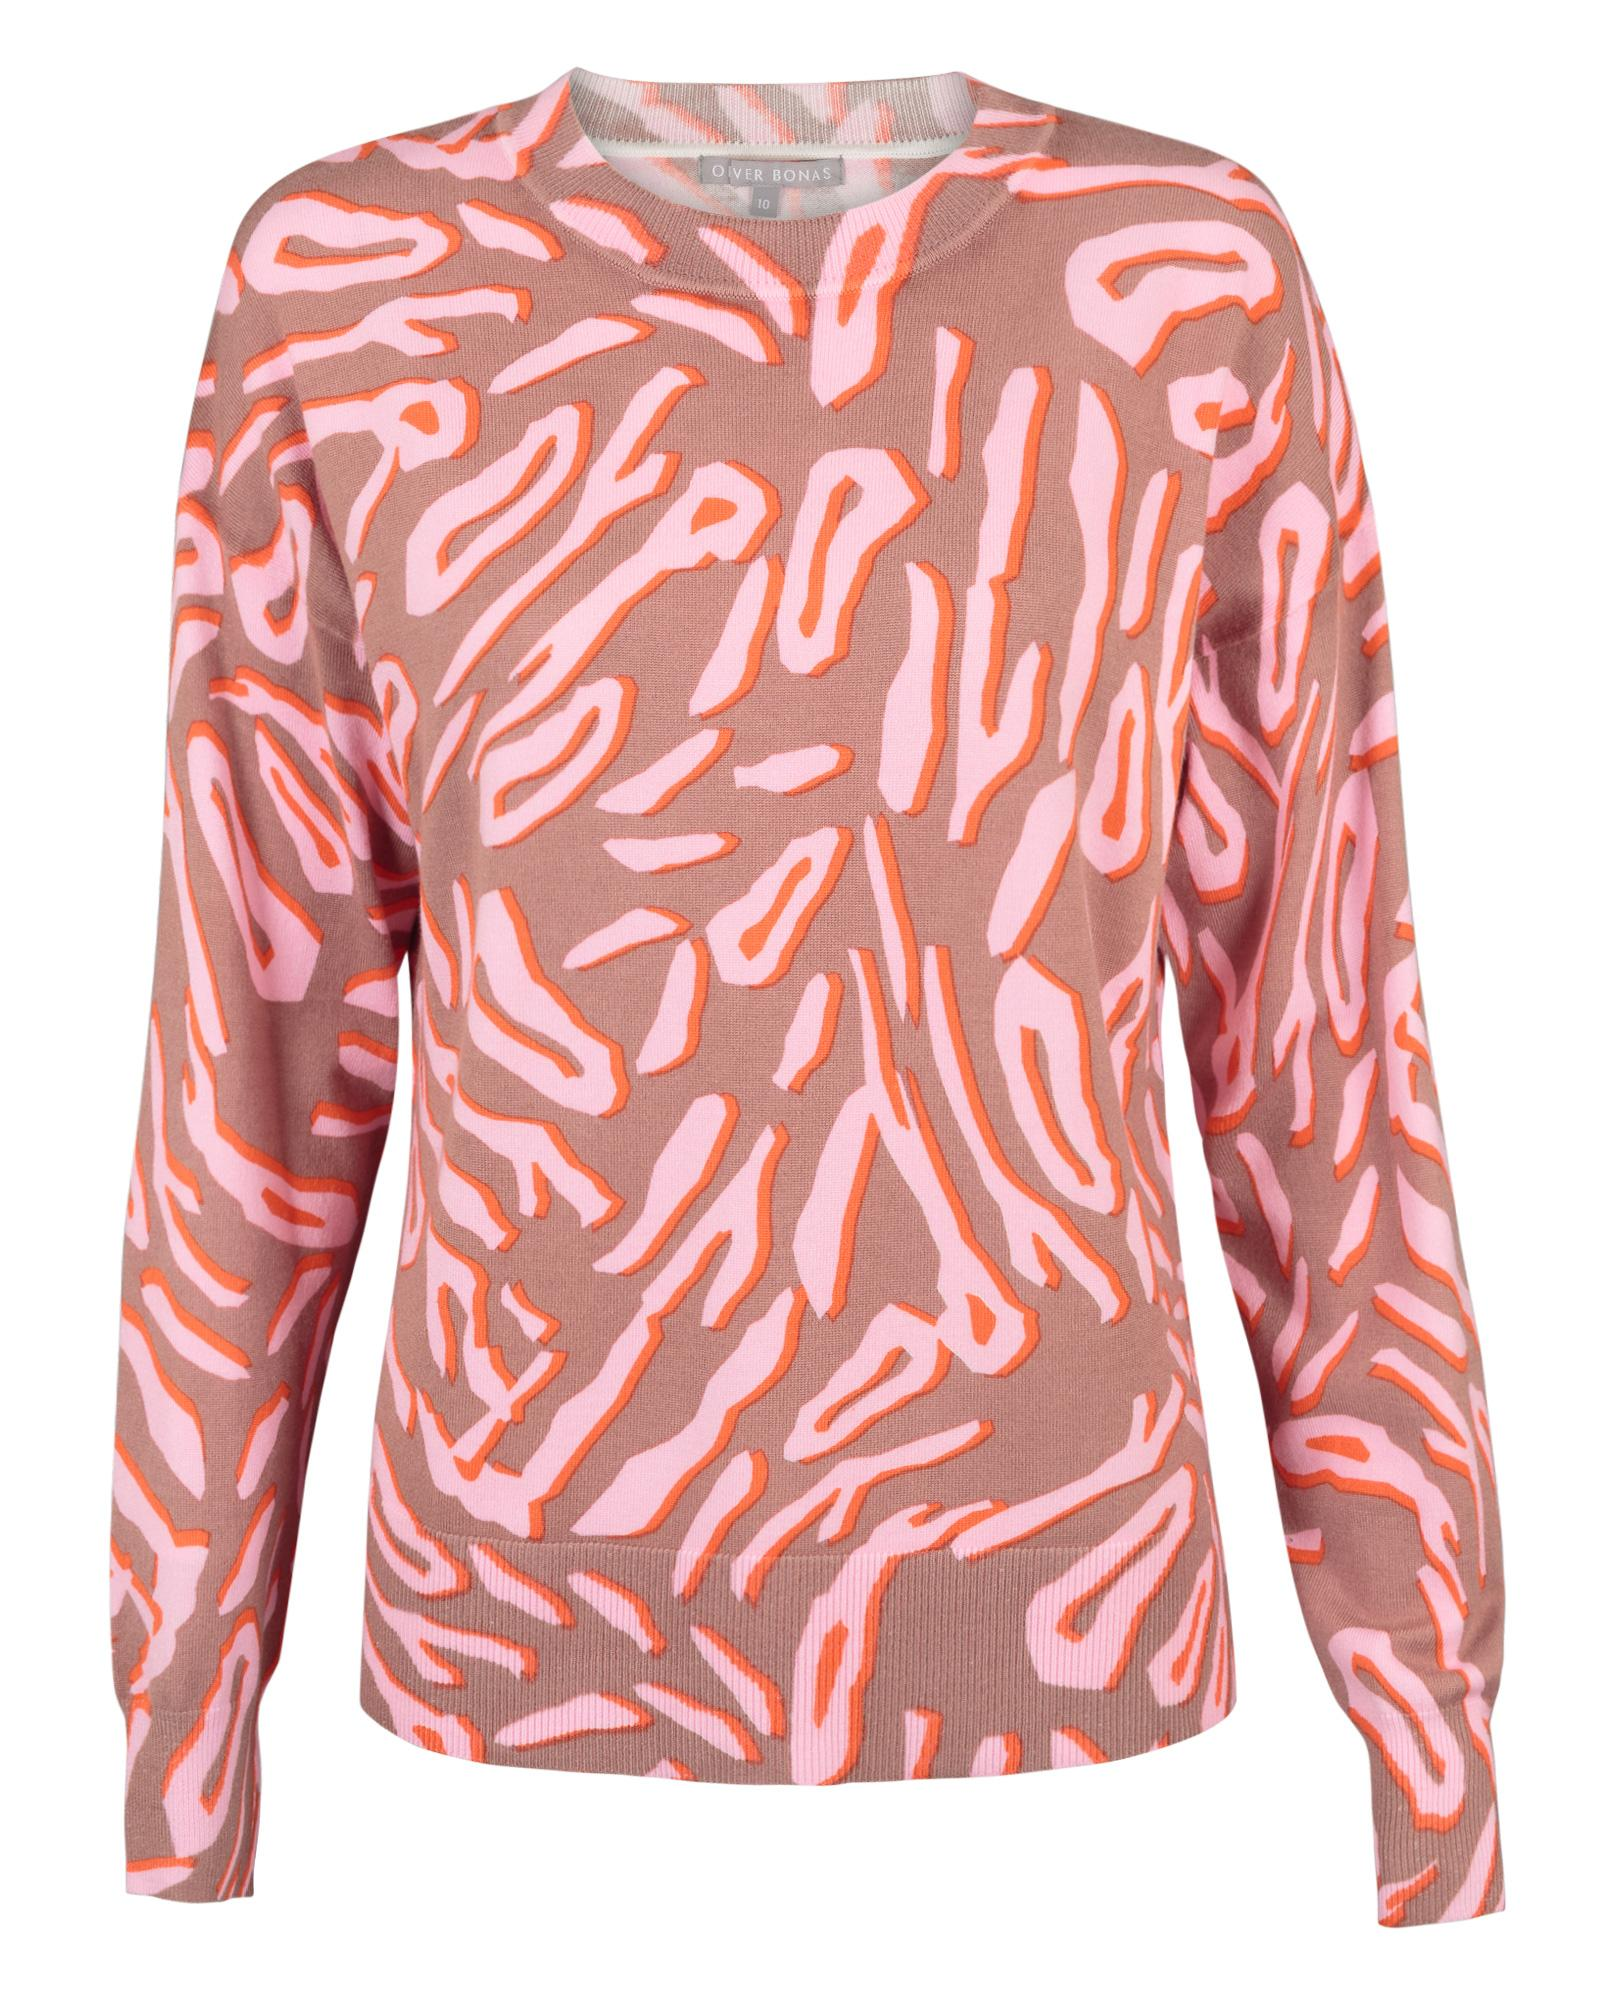 7d5f3b0392 Lyst - Oliver Bonas Animal Print Camel Sweater in Brown